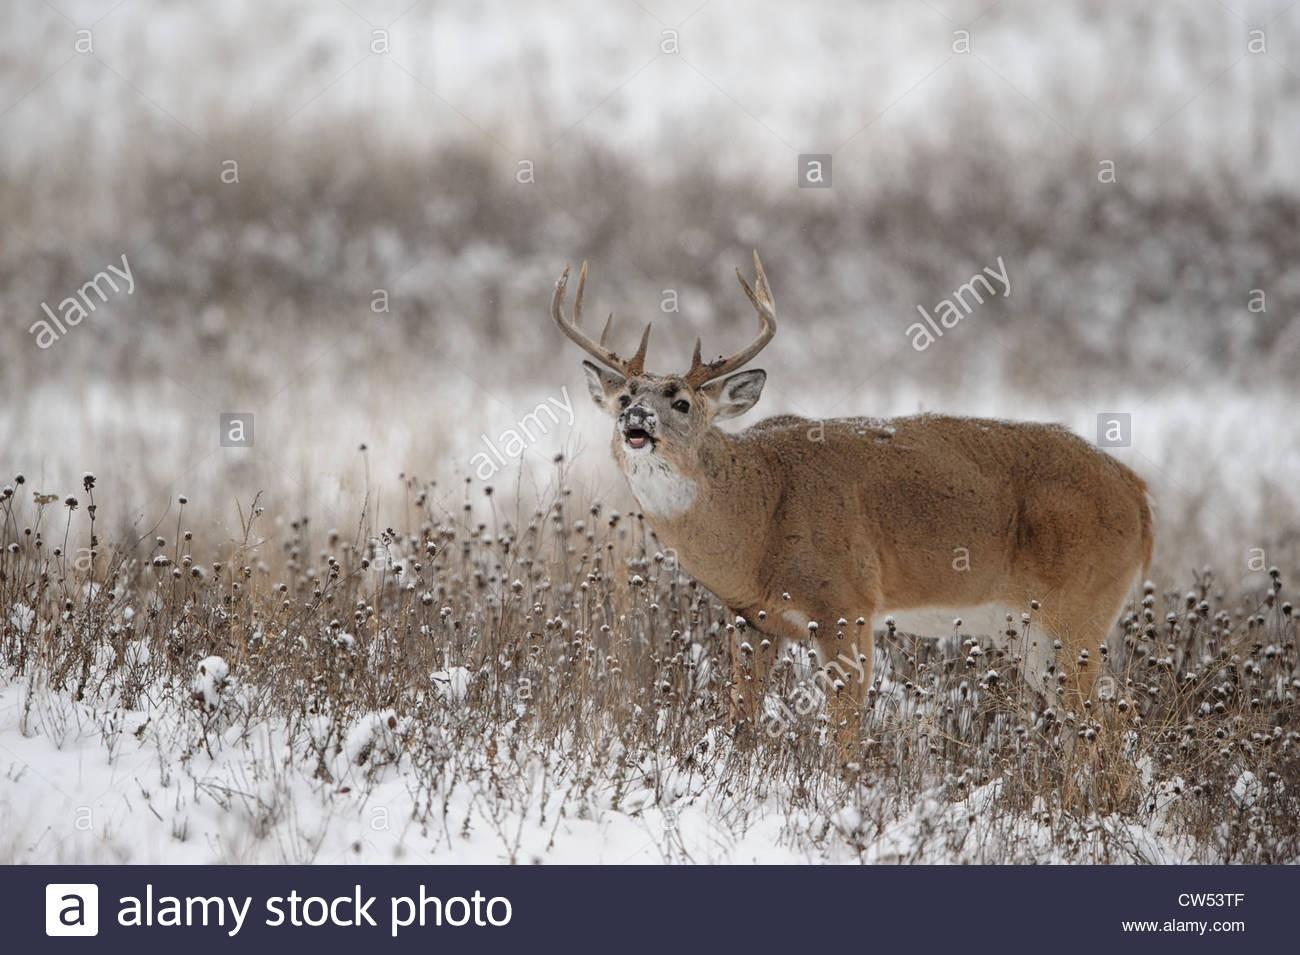 Whitetail Deer Snow Stock Photos & Whitetail Deer Snow Stock Images - Alamy-2021 Nys White Tail Rut